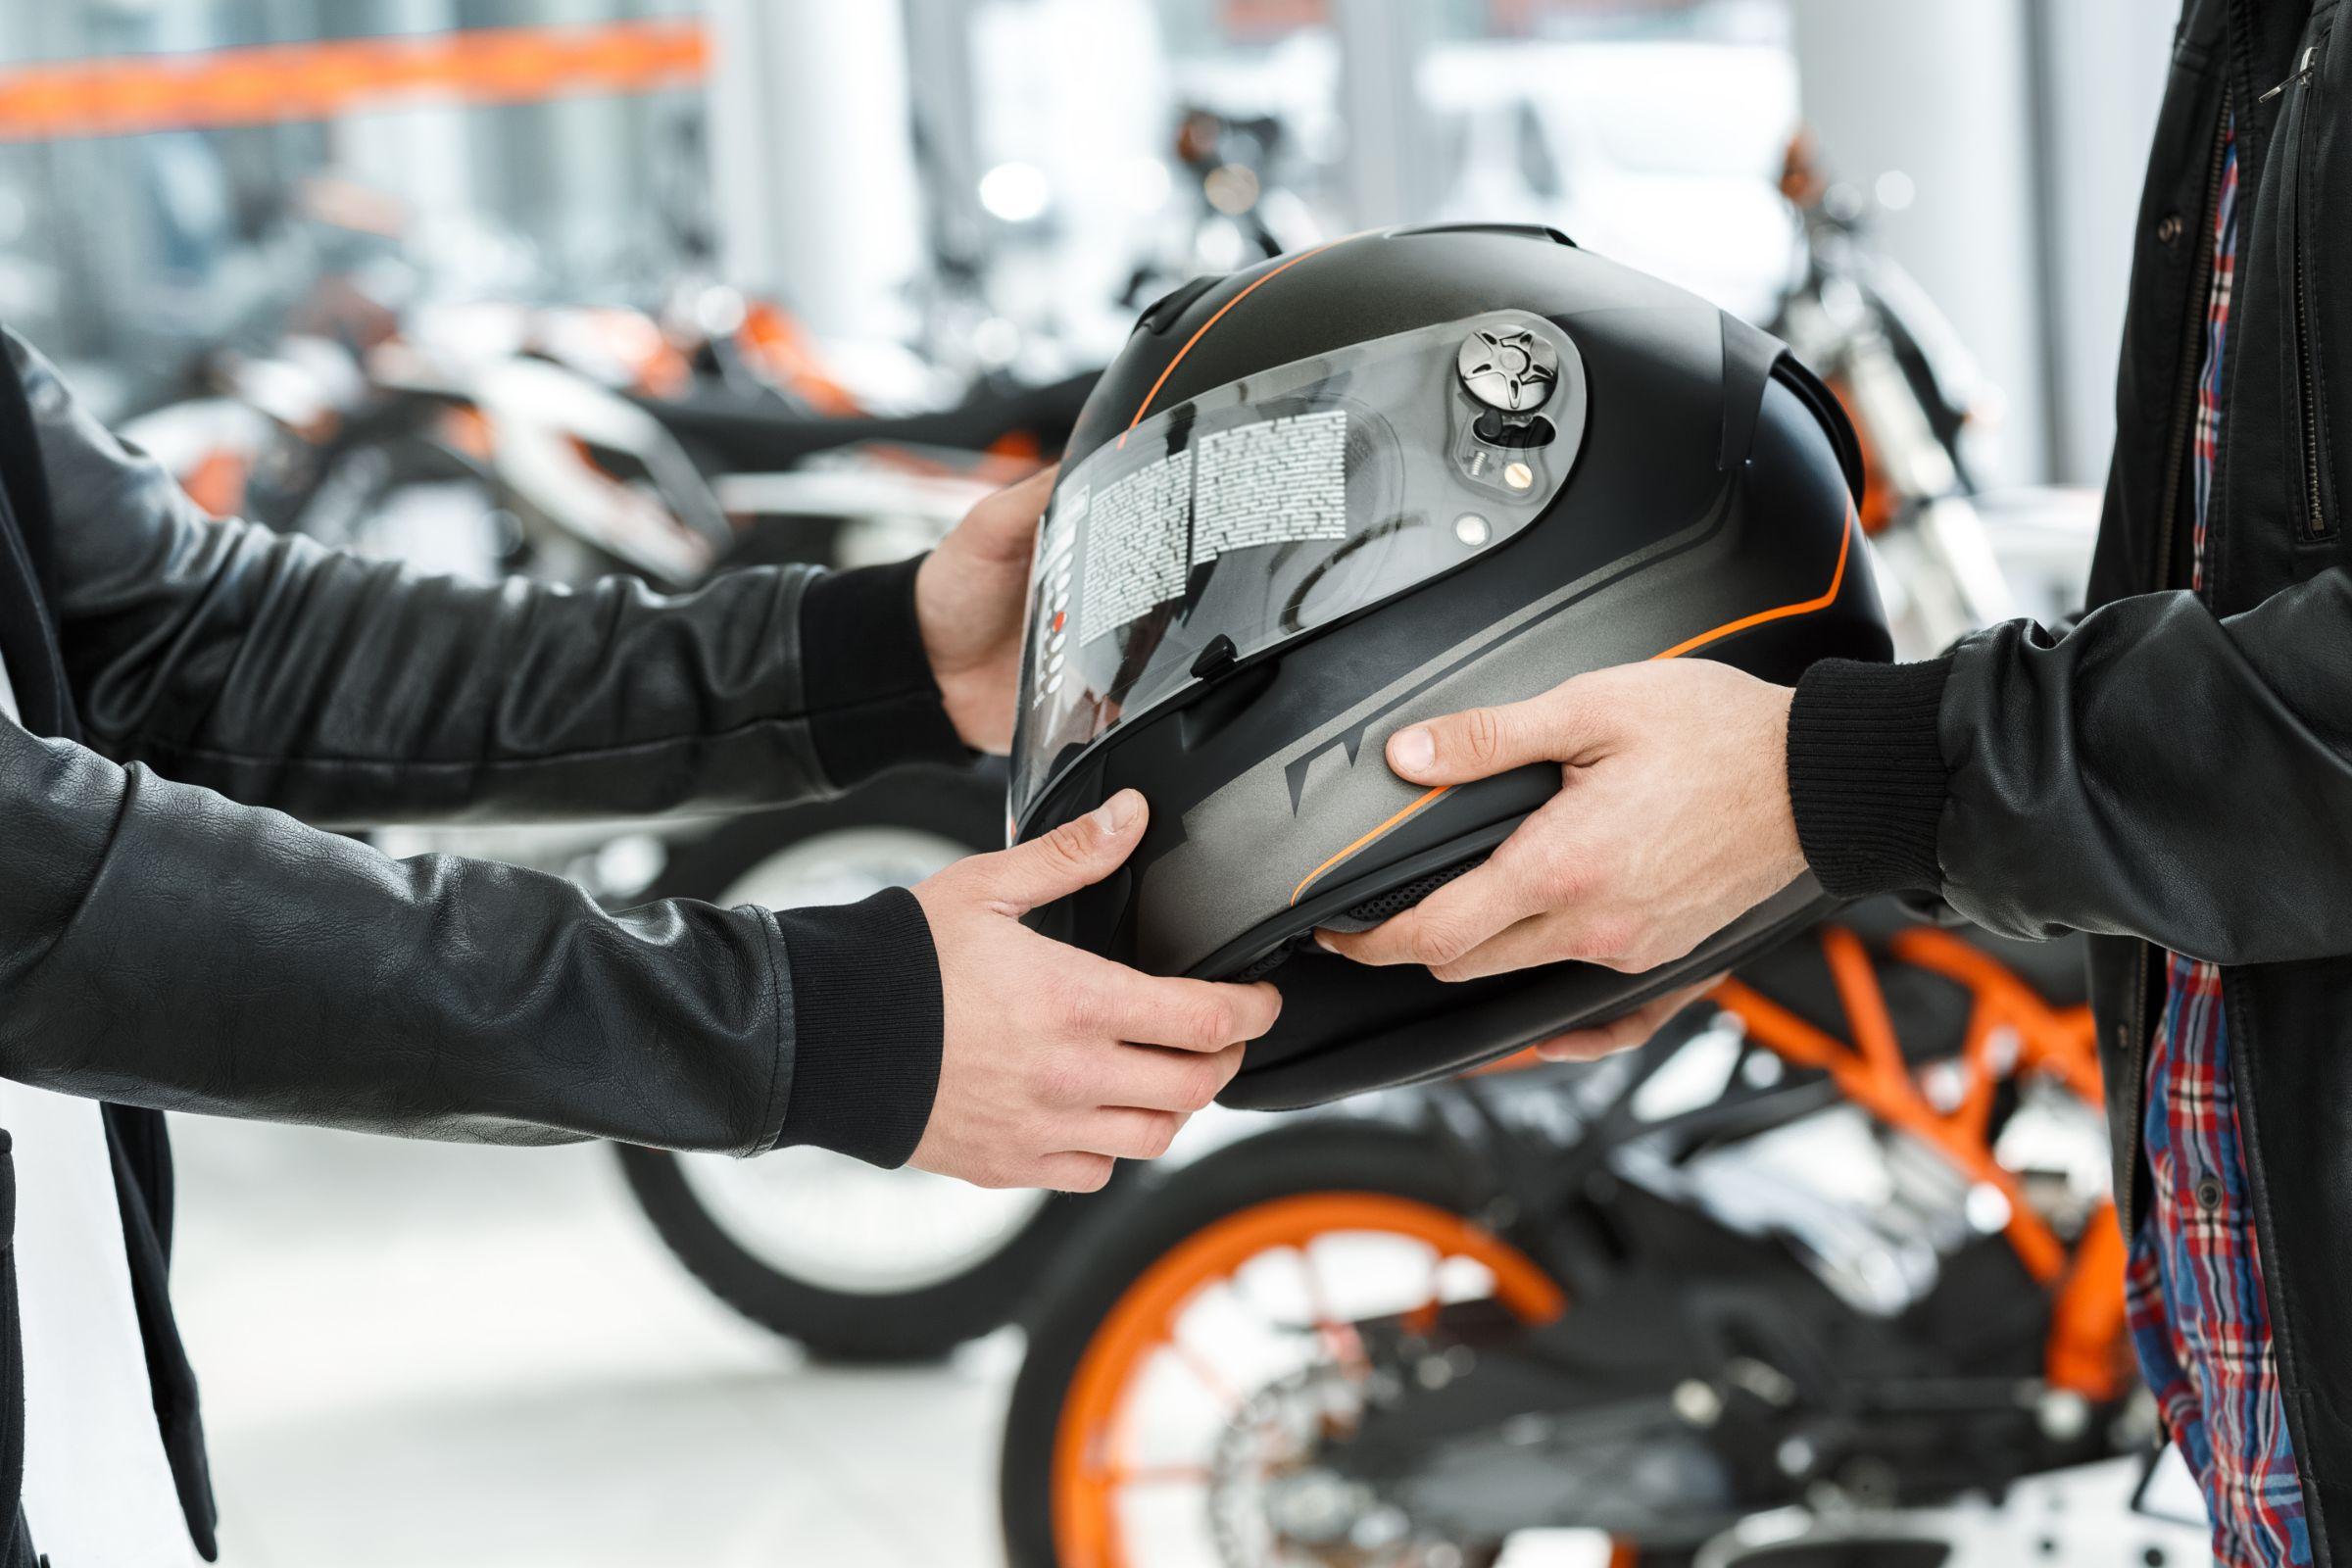 vendedor entrega capacete preto a motociclista